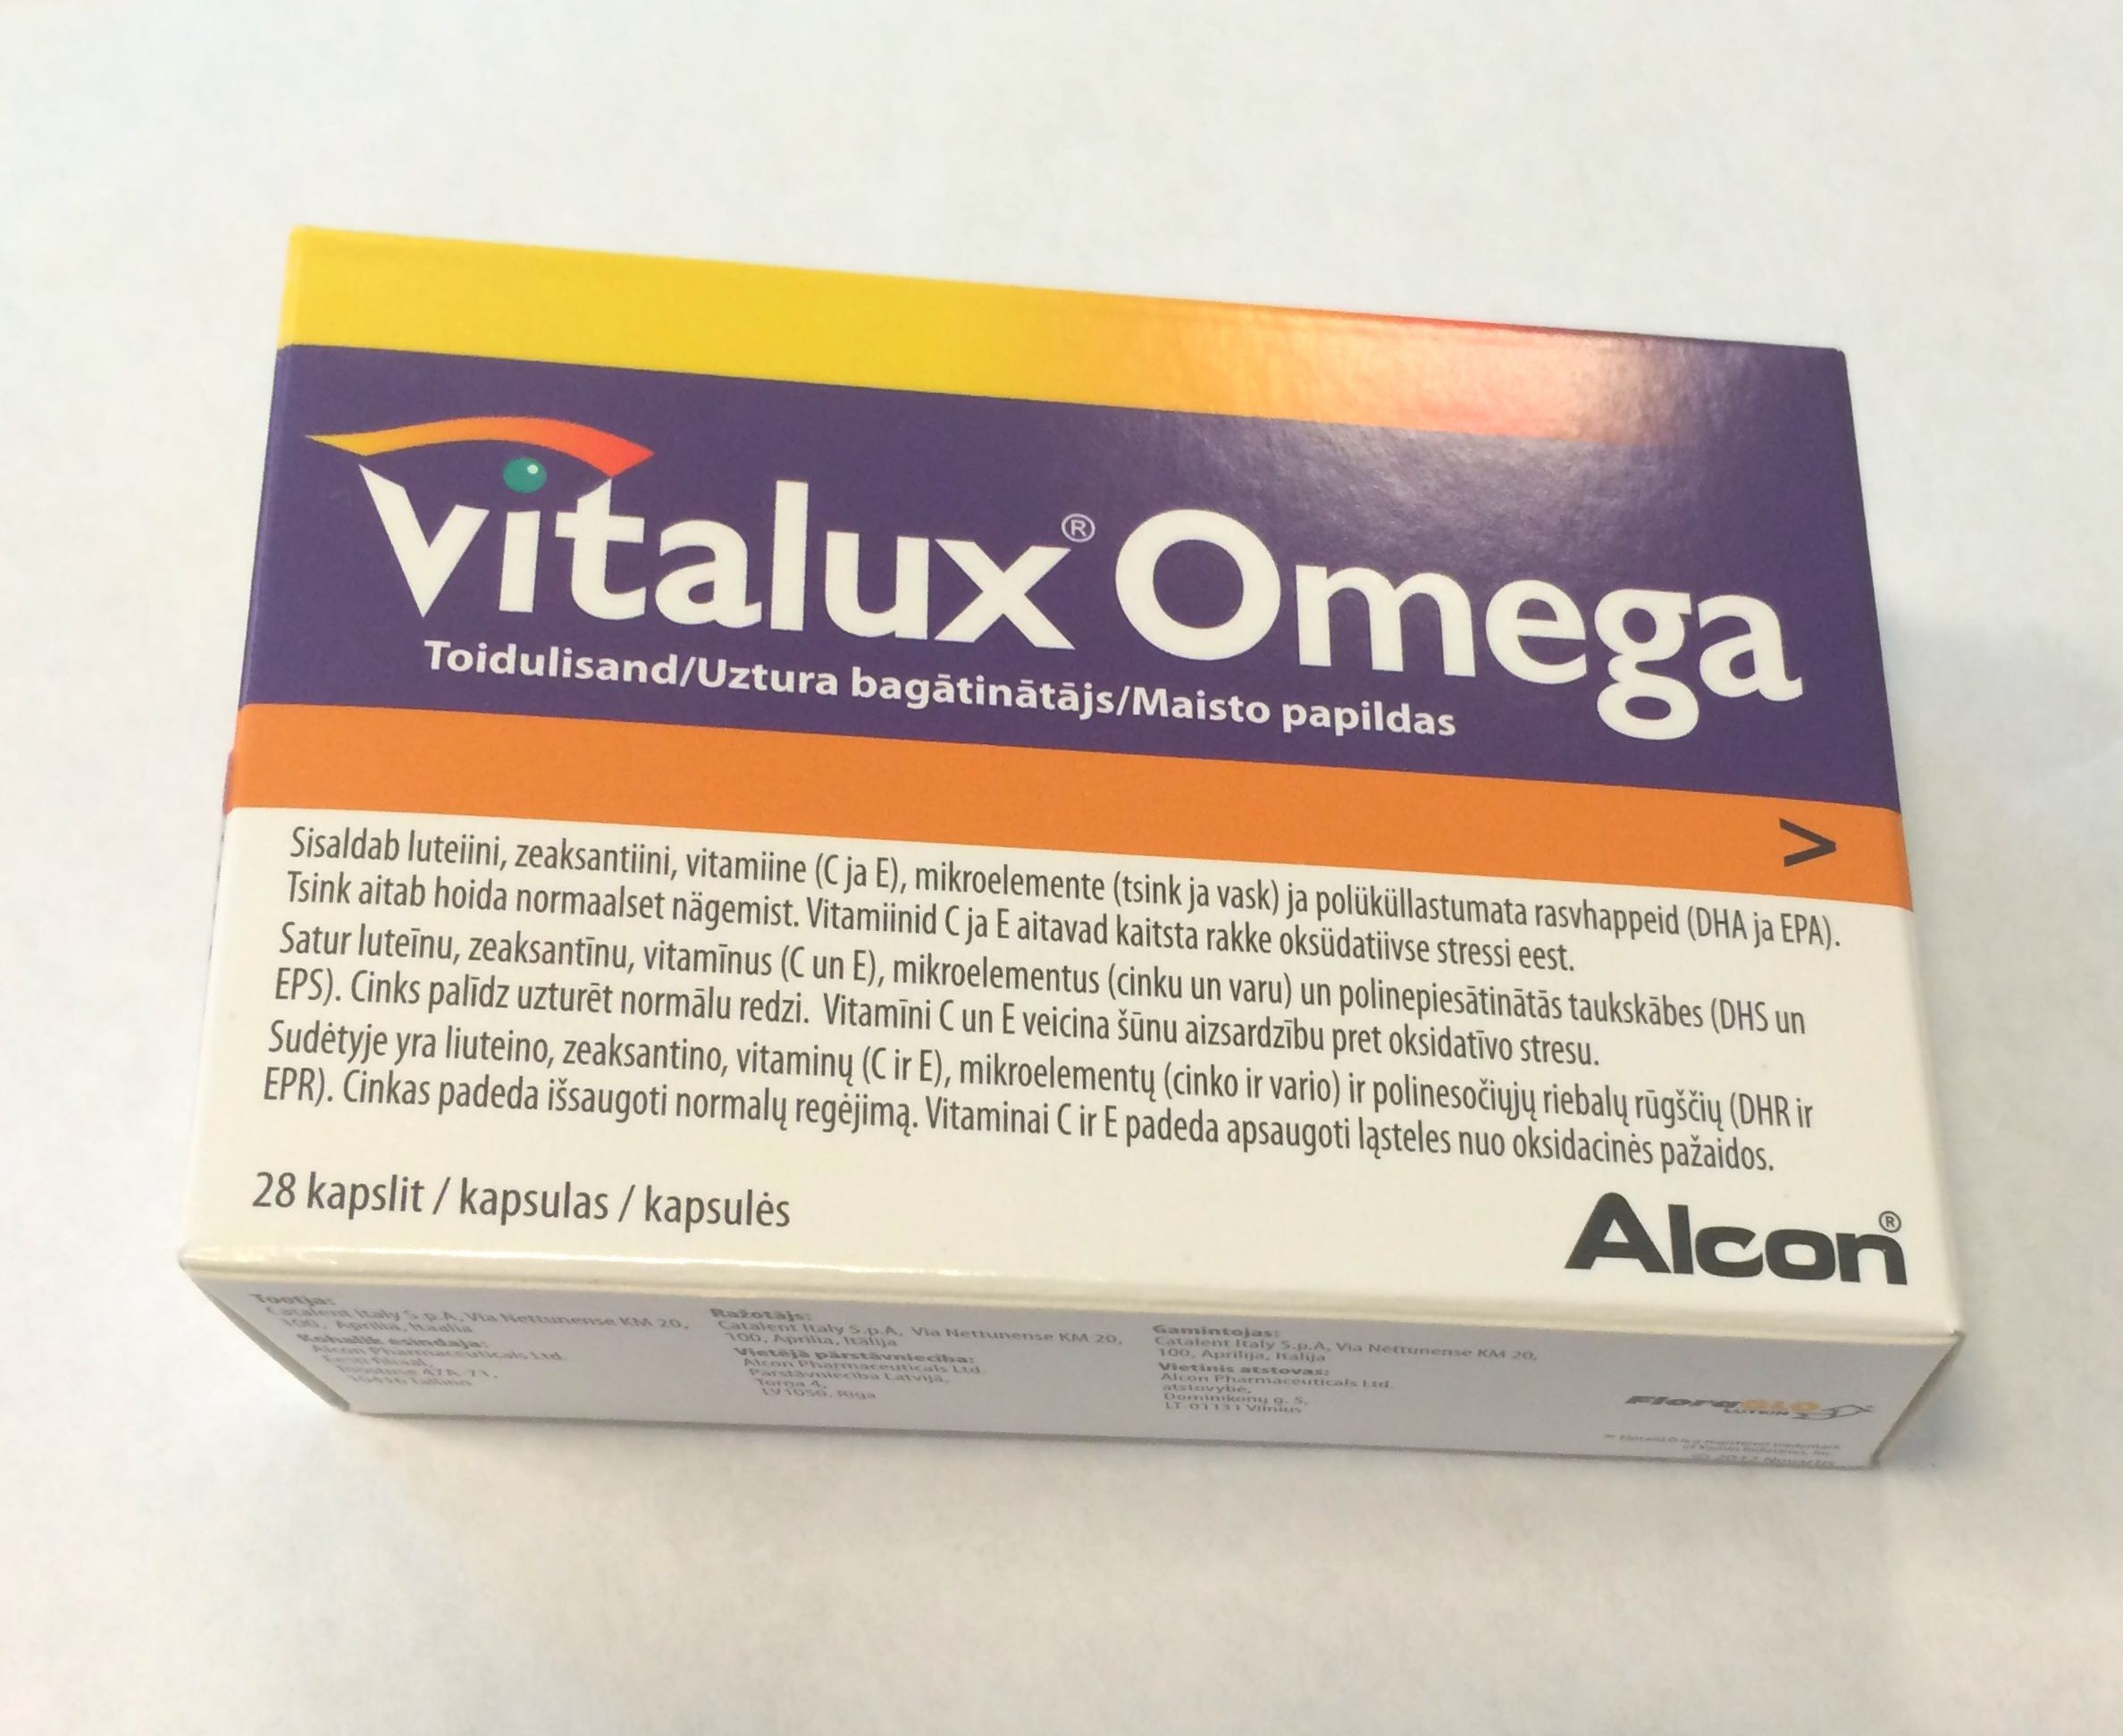 Vitalux Omega